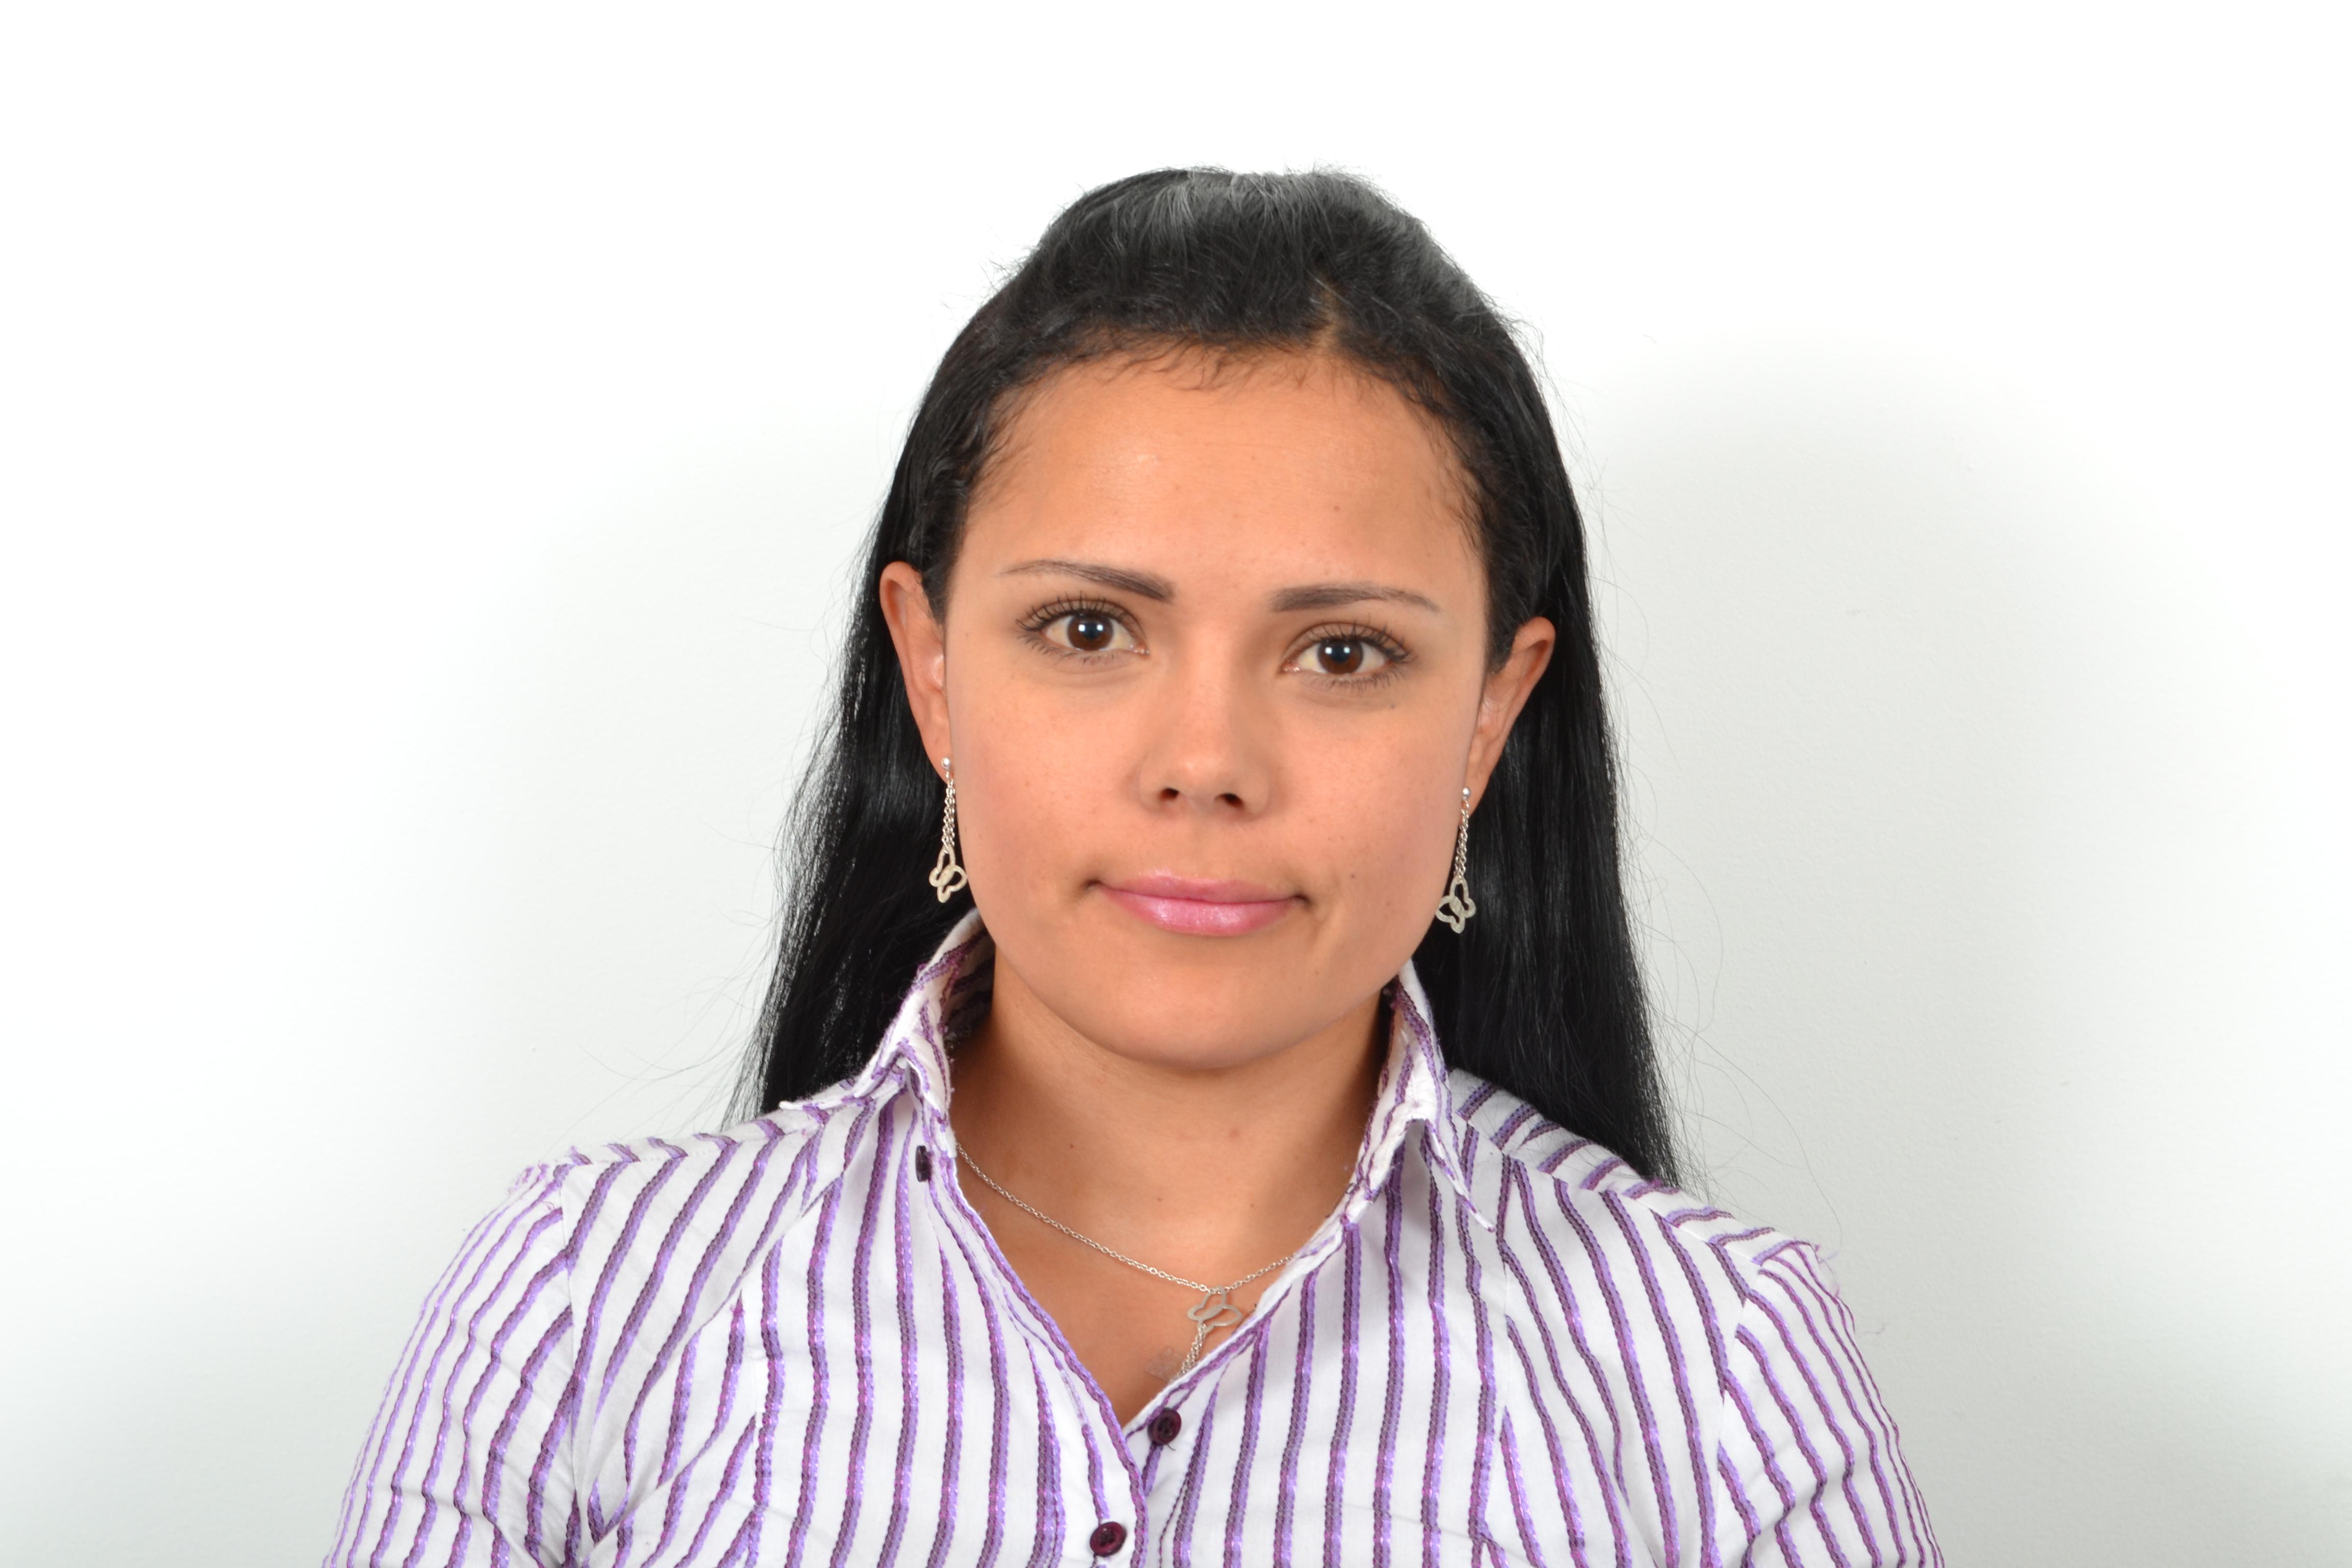 Haidy Moreno